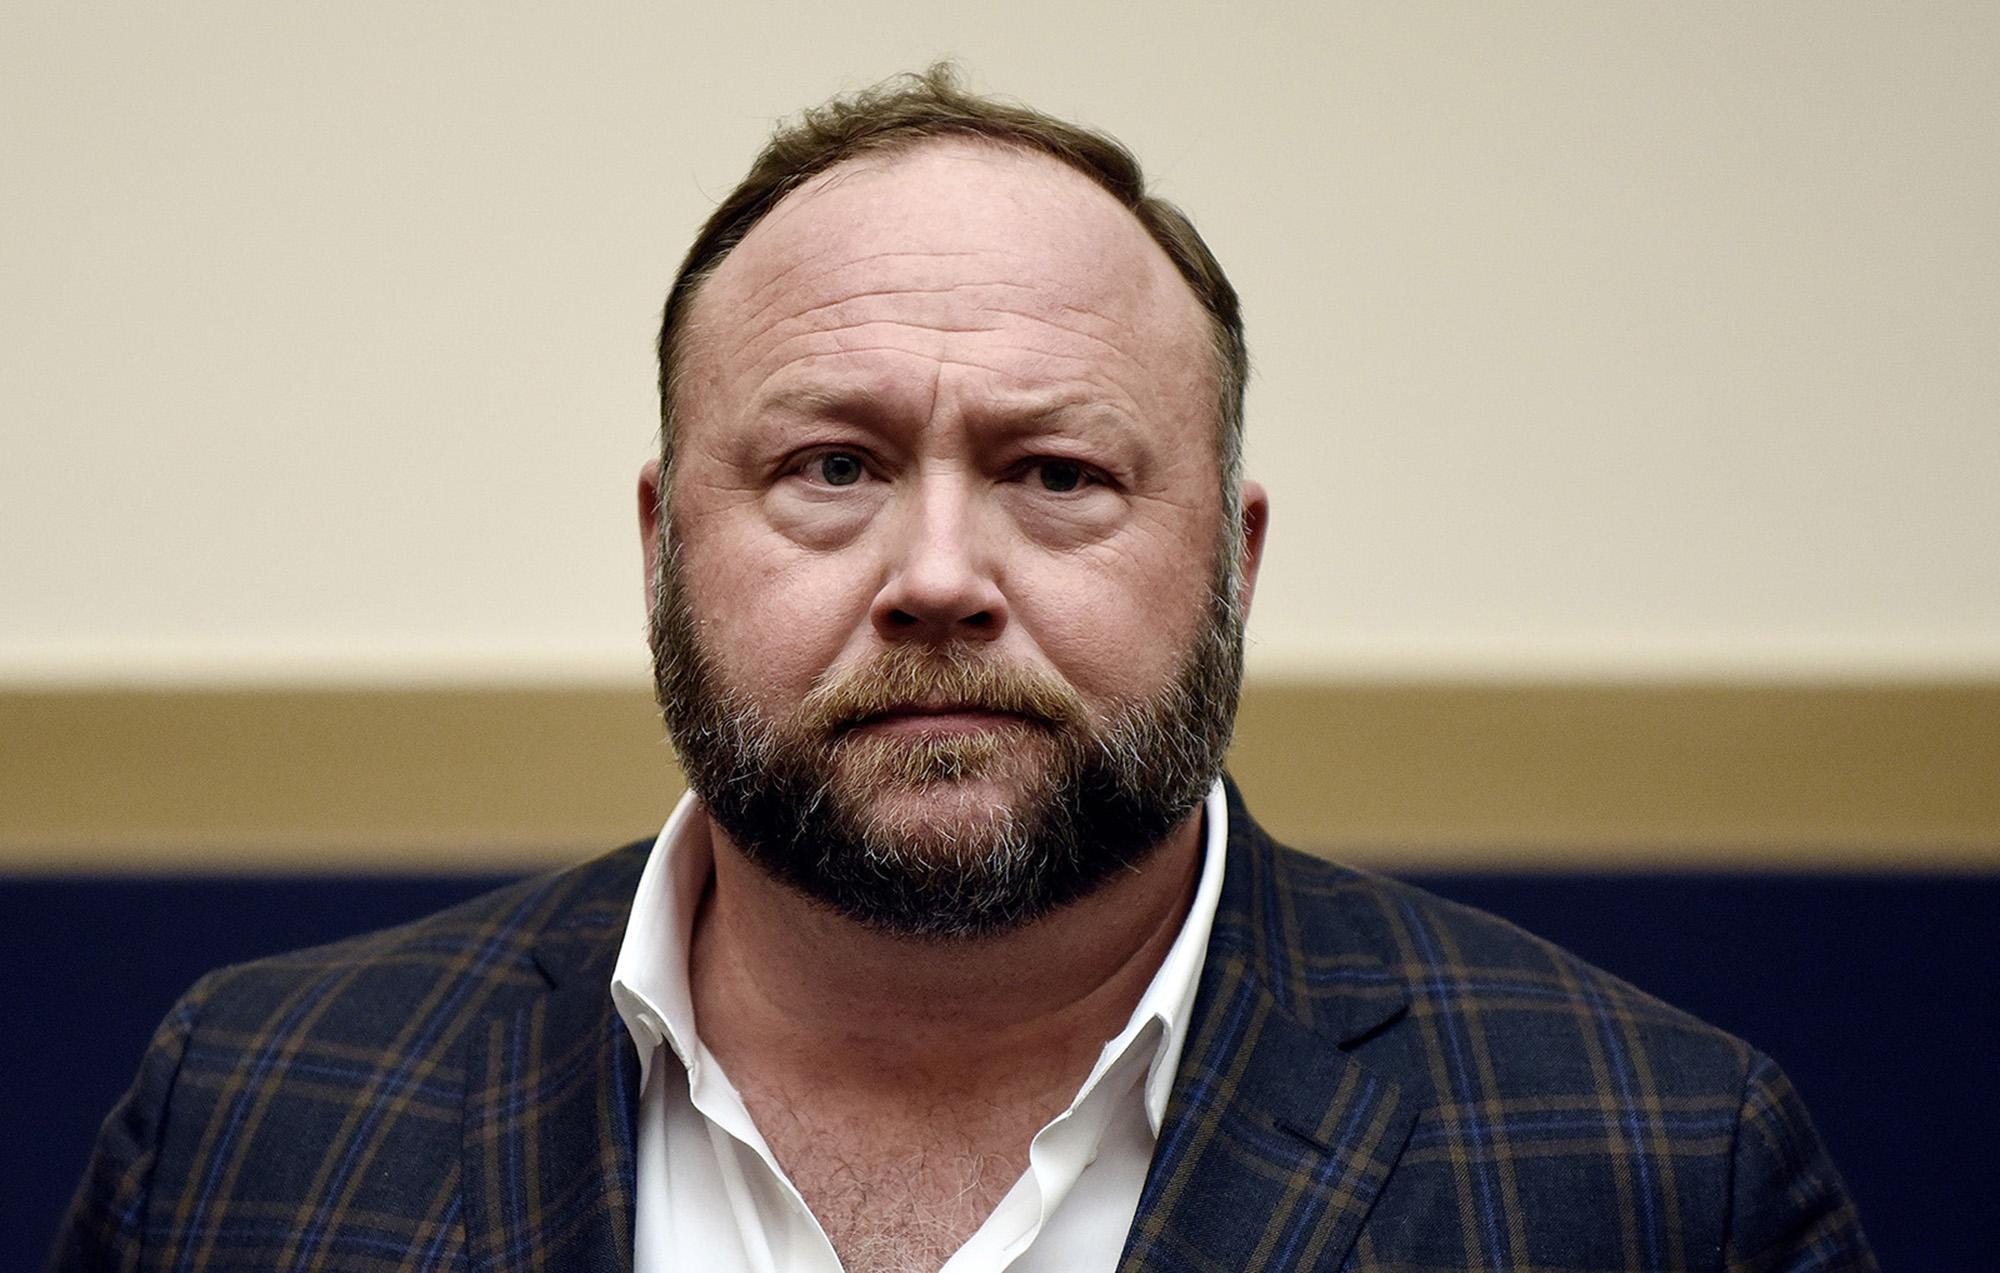 Alex Jones Porn lawyers for sandy hook families say alex jones sent them